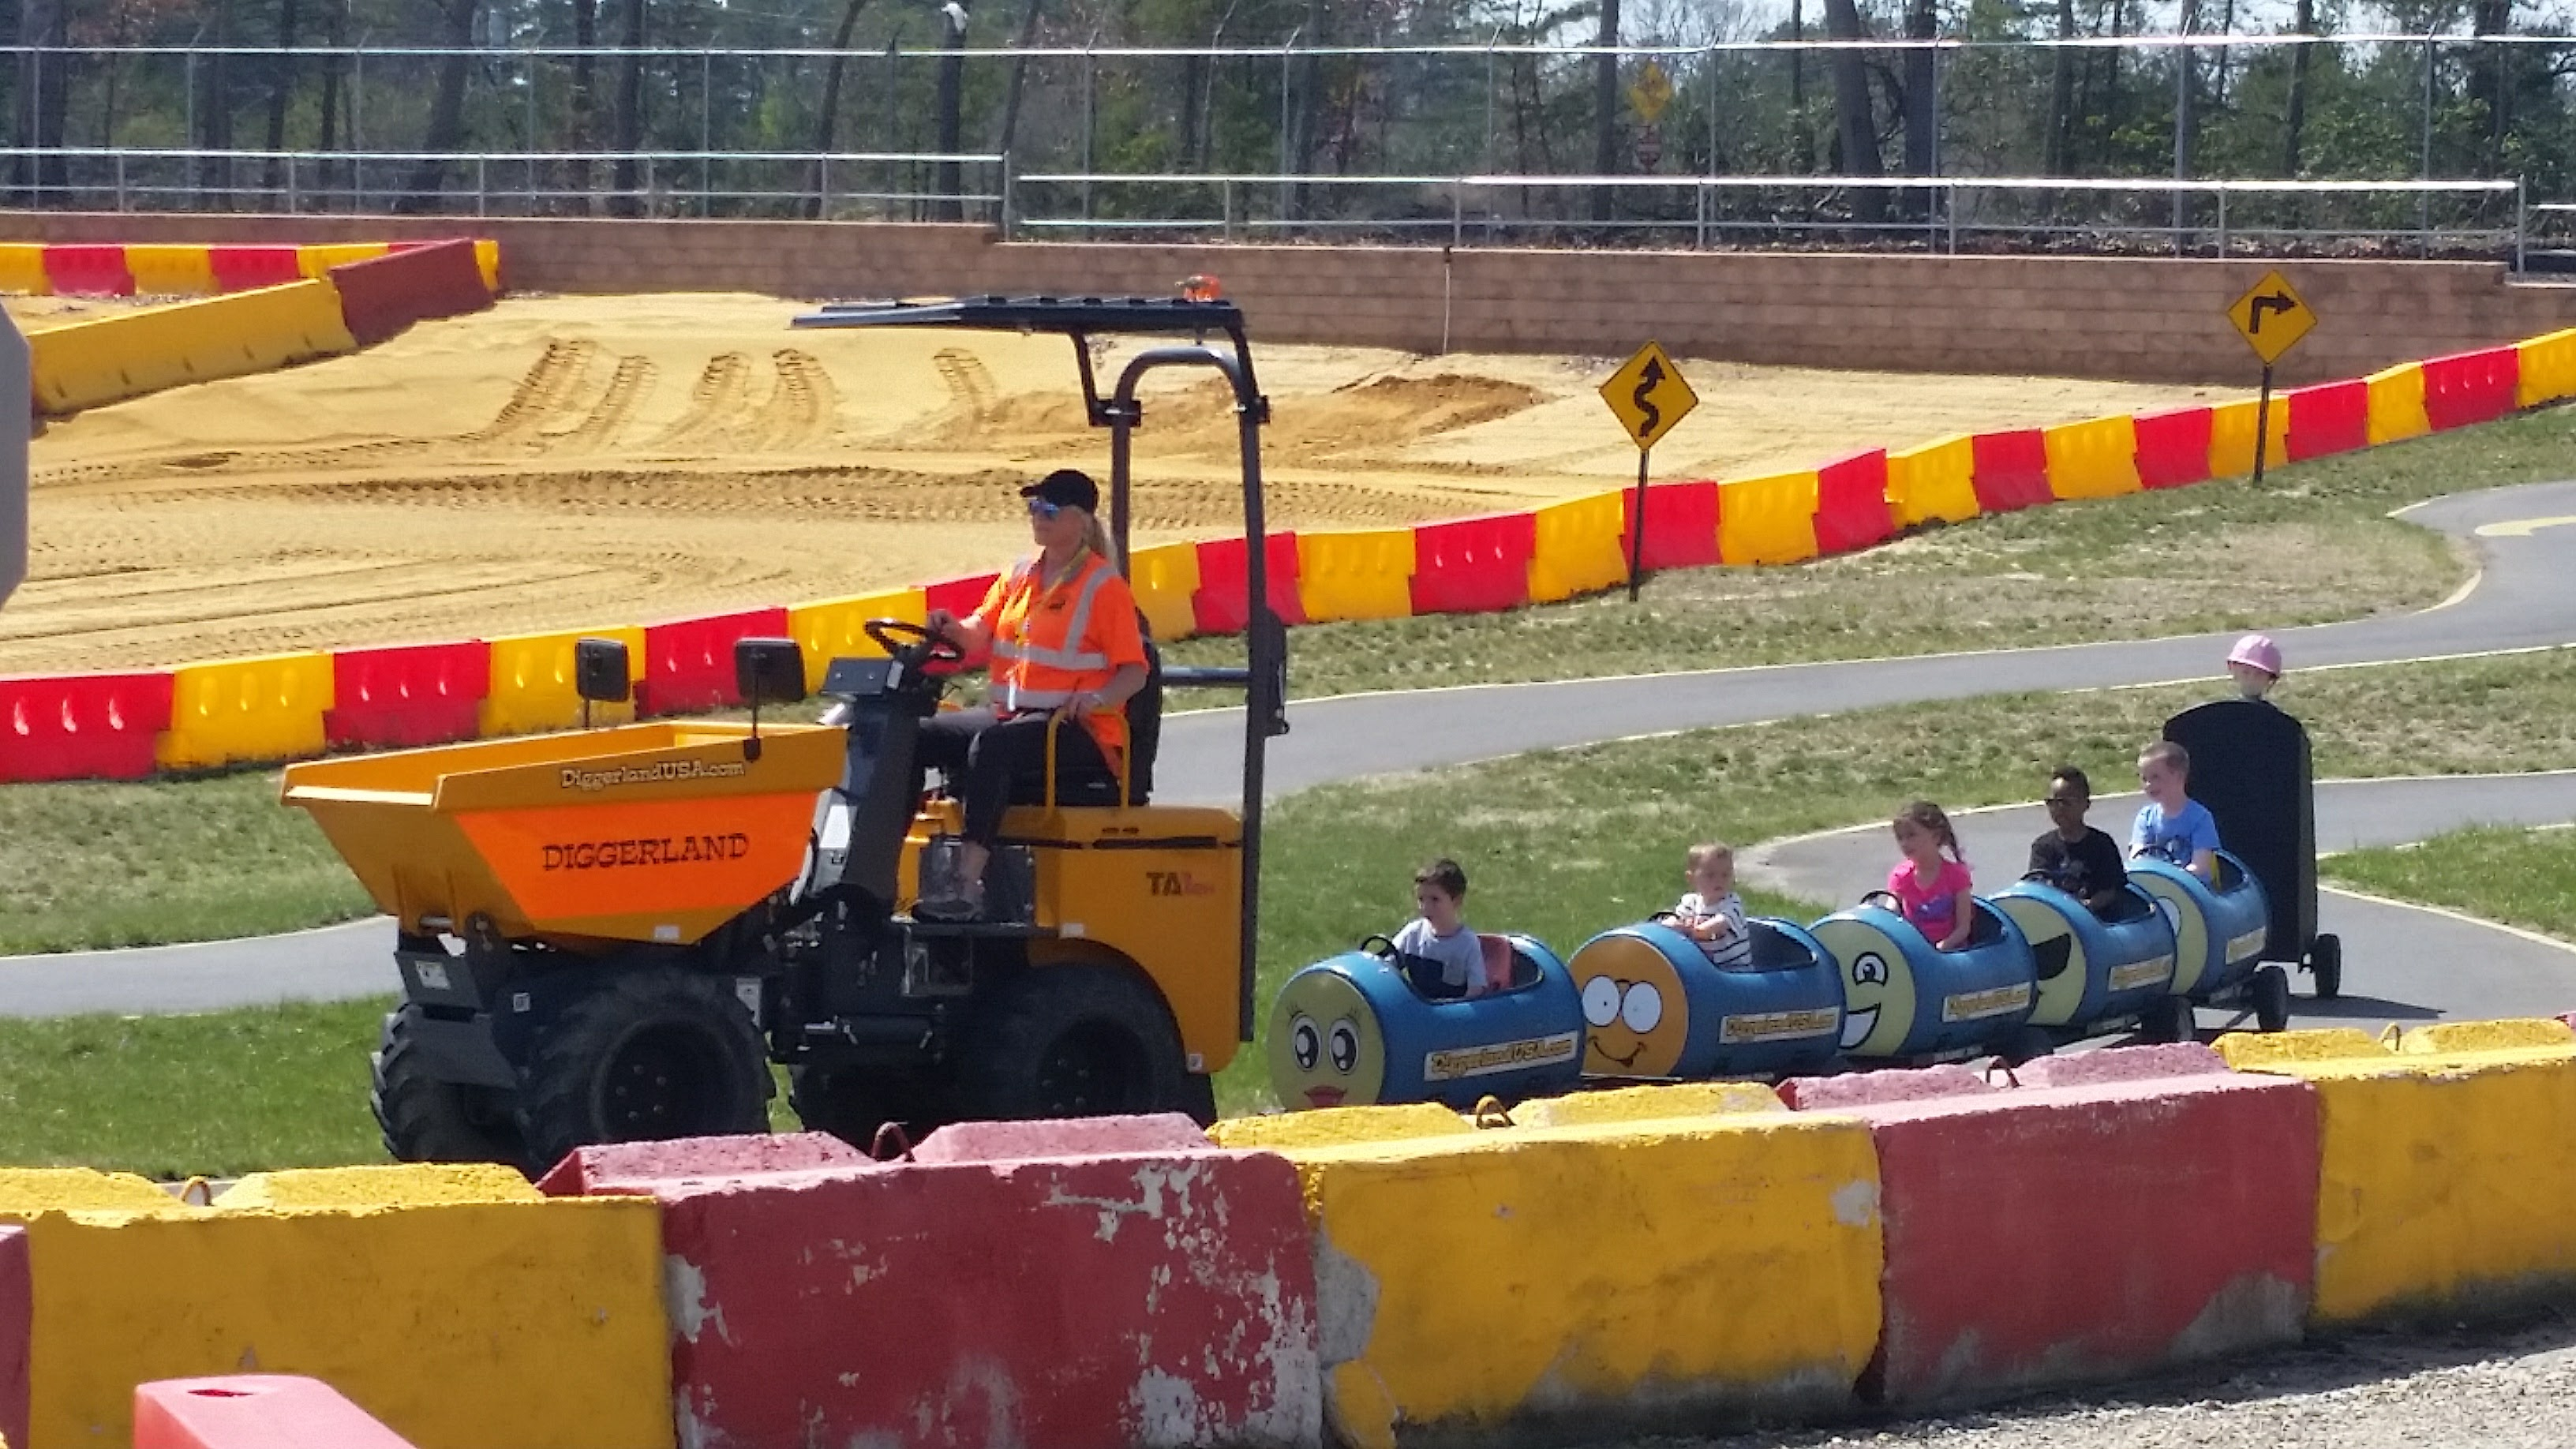 Barrel train at Diggerland USA theme park